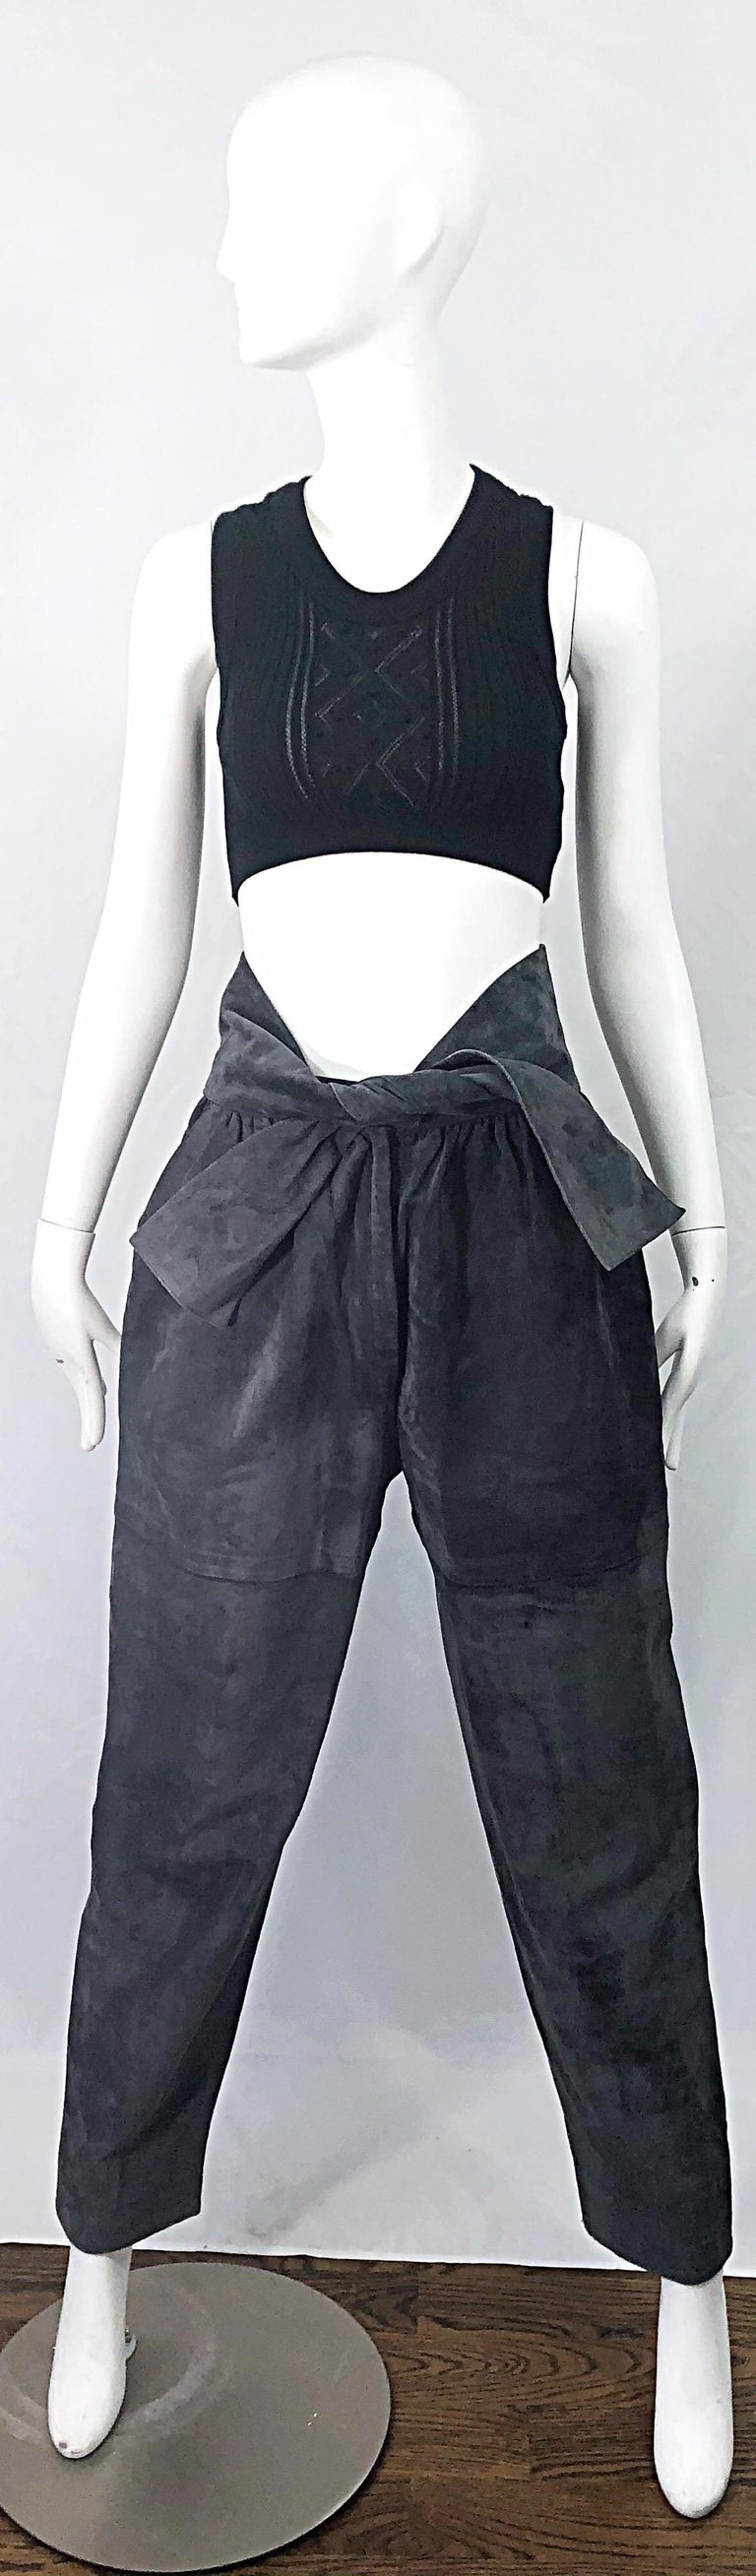 Vintage Yves Saint Laurent YSL 1980s Grey Suede Leather High Waisted Harem Pants For Sale 12